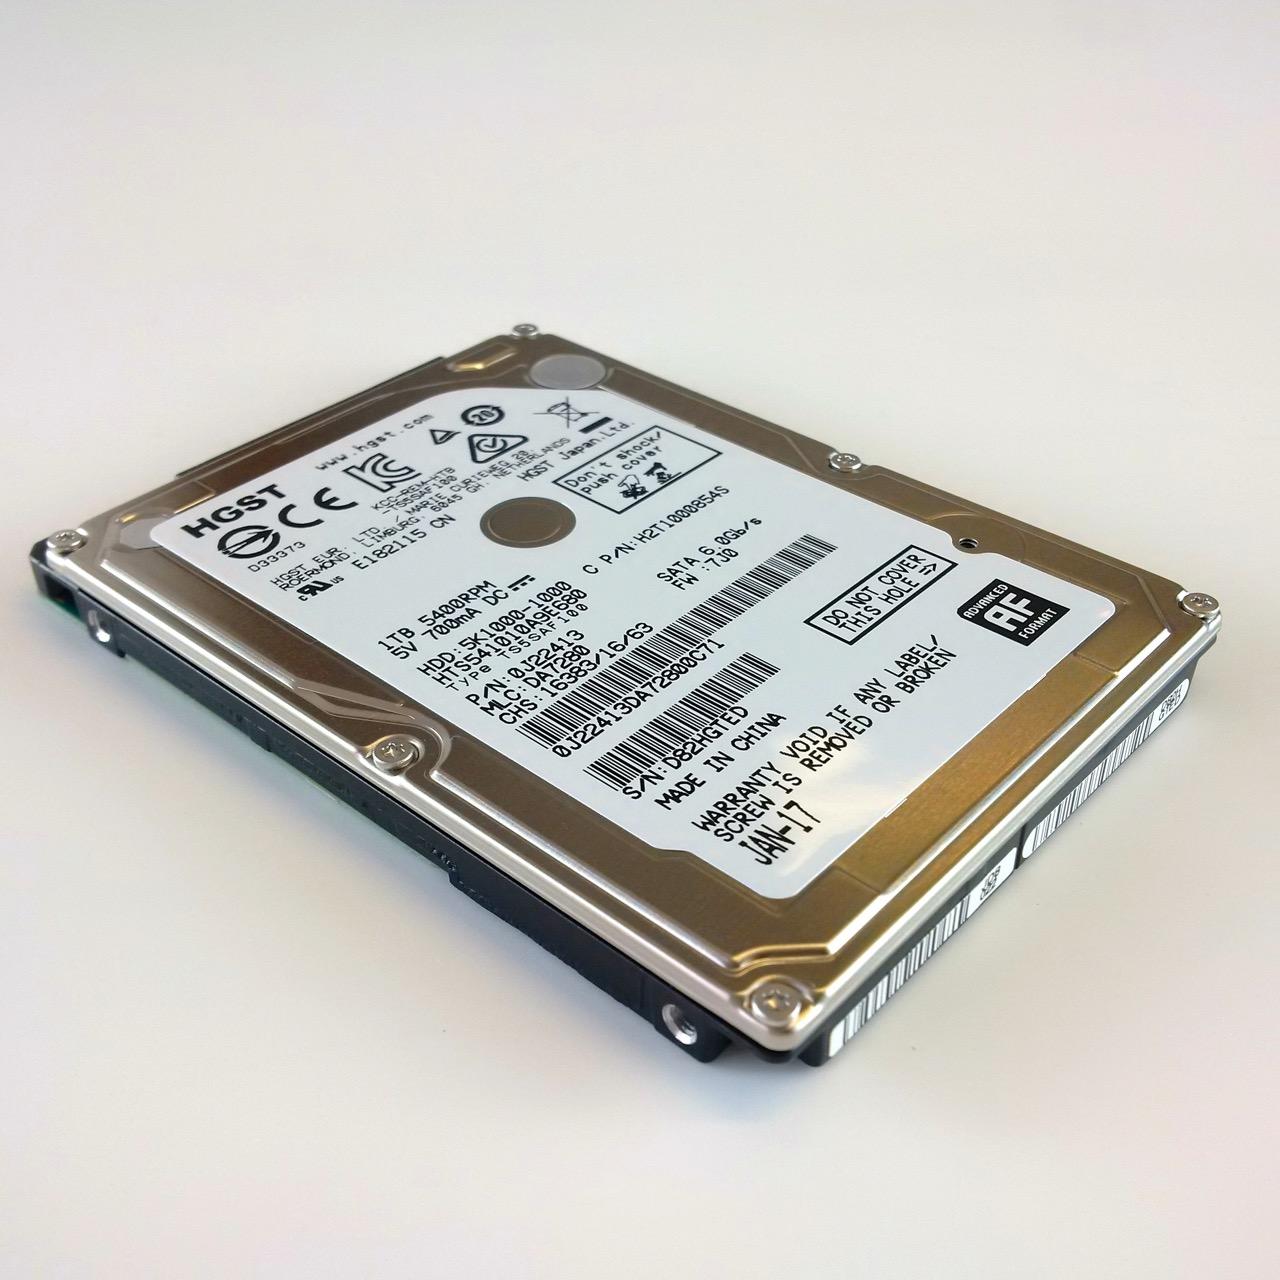 Harddisk for free. Kostenlose Festplatte